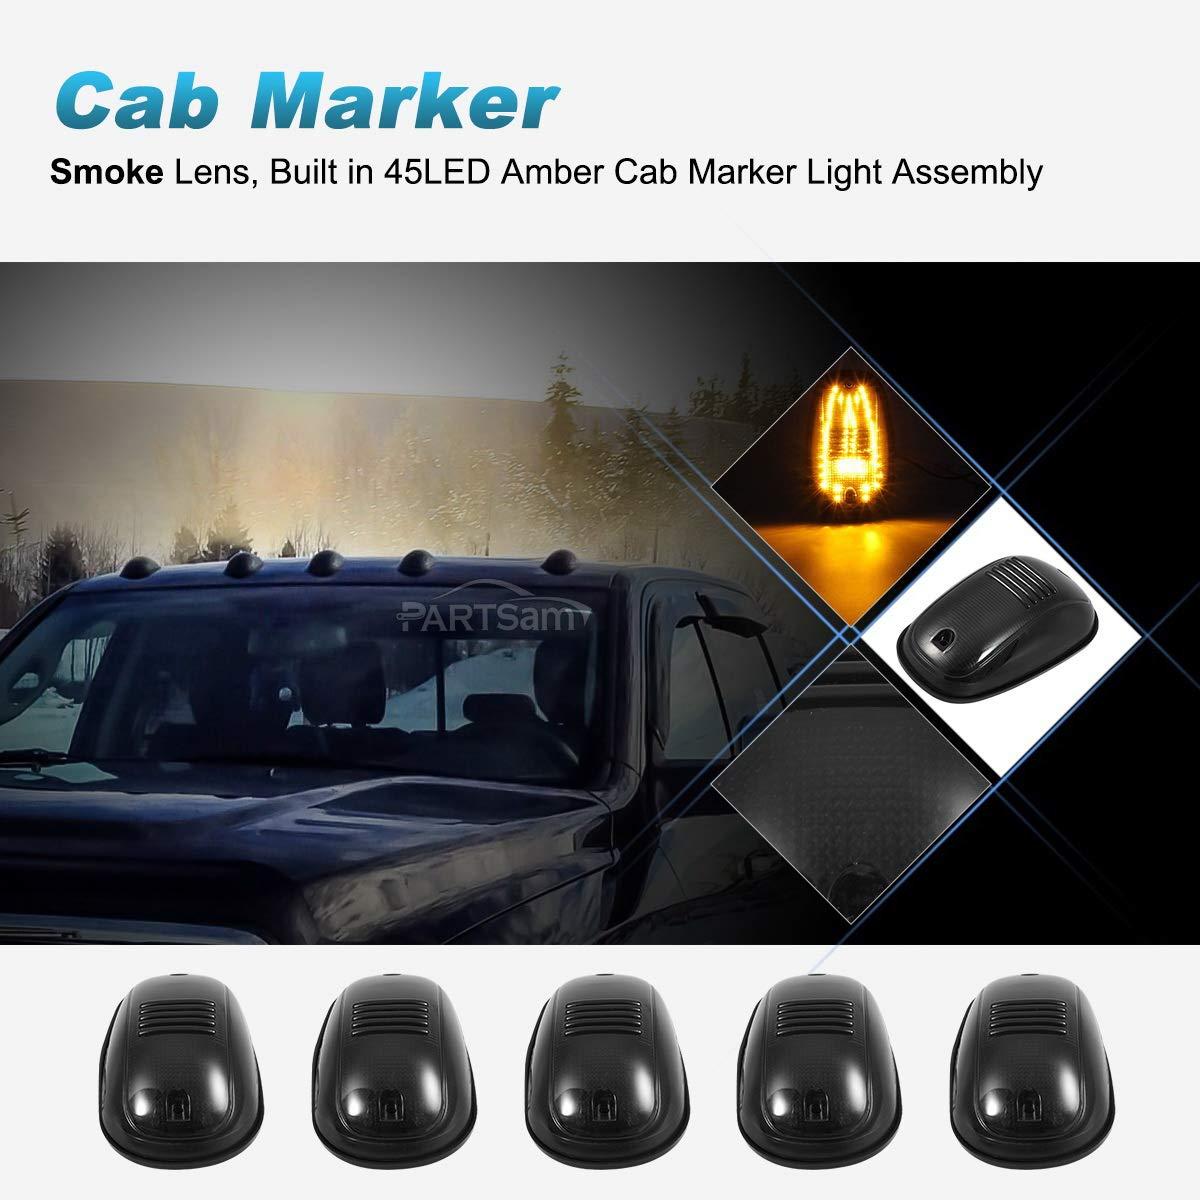 Partsam 5PCS Smoke Cover Lens Cab Marker Roof Running Light Amber 45LED Top Light Assembly Total 225LED Compatible with Dodge Ram 1500 2500 3500 4500 5500 2003-2018 Pickup Trucks